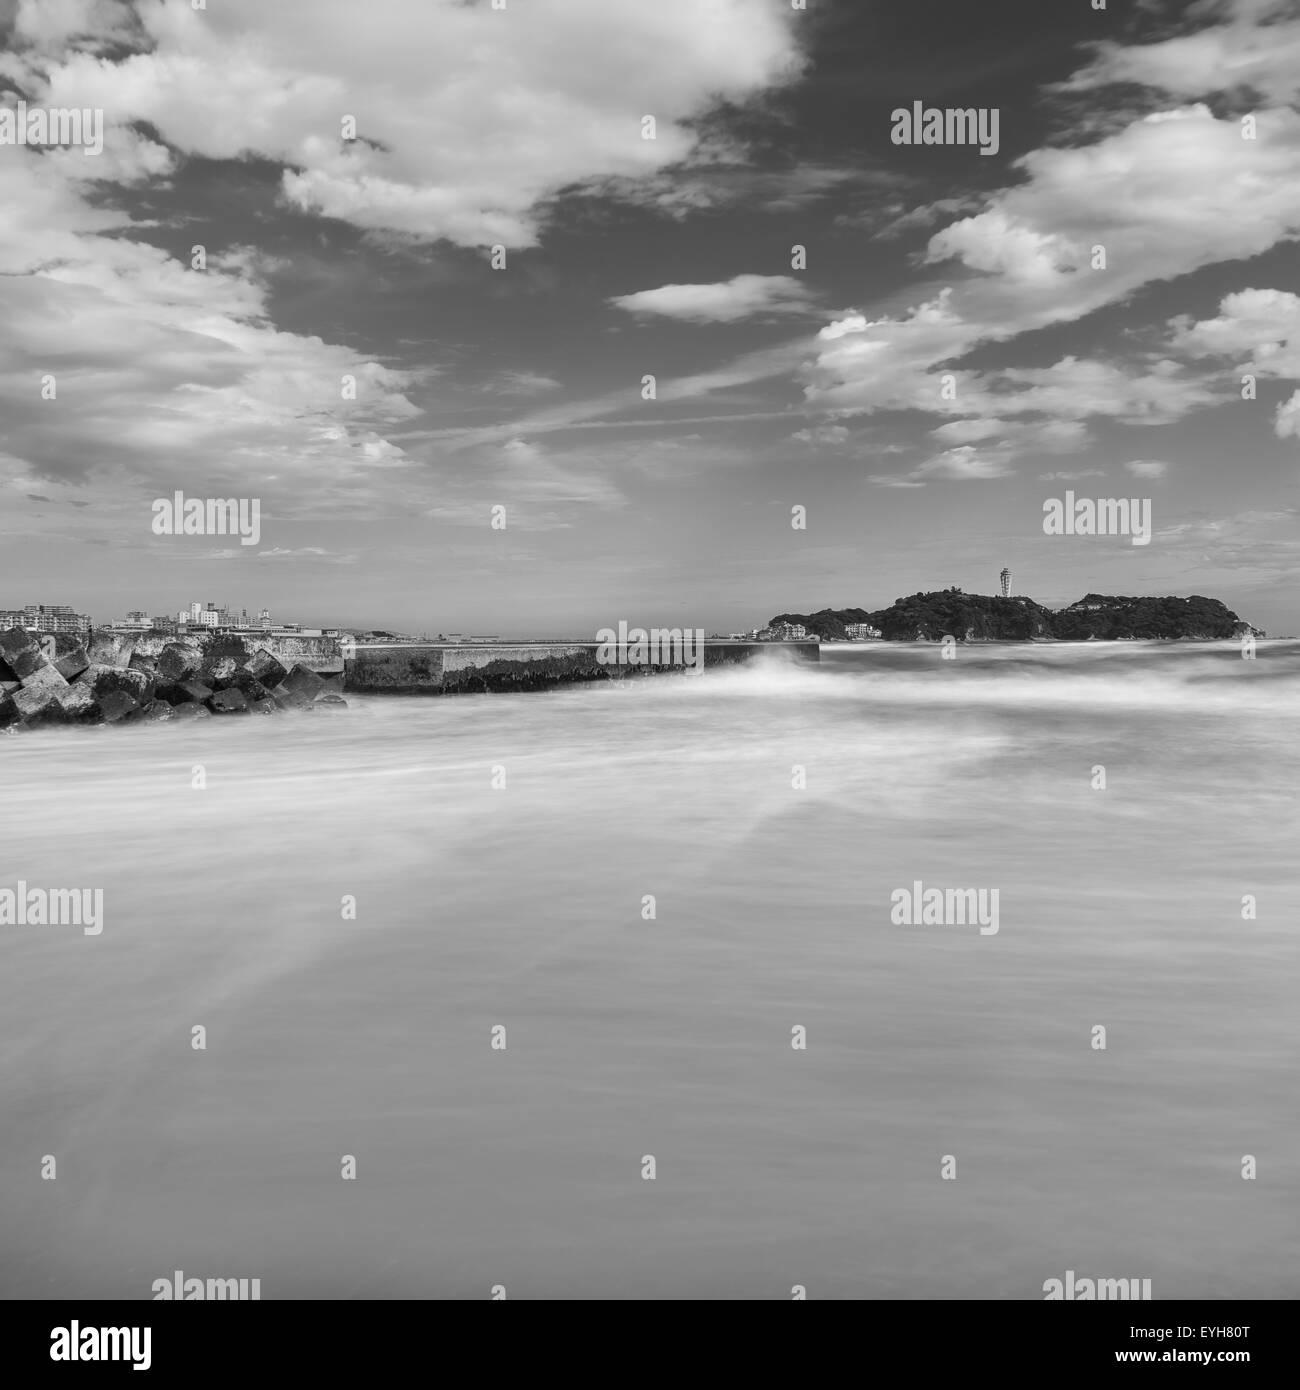 Waves crashing on the shore at Kugenuma-Kaigan beach, Kanagawa Prefecture, Japan - Stock Image